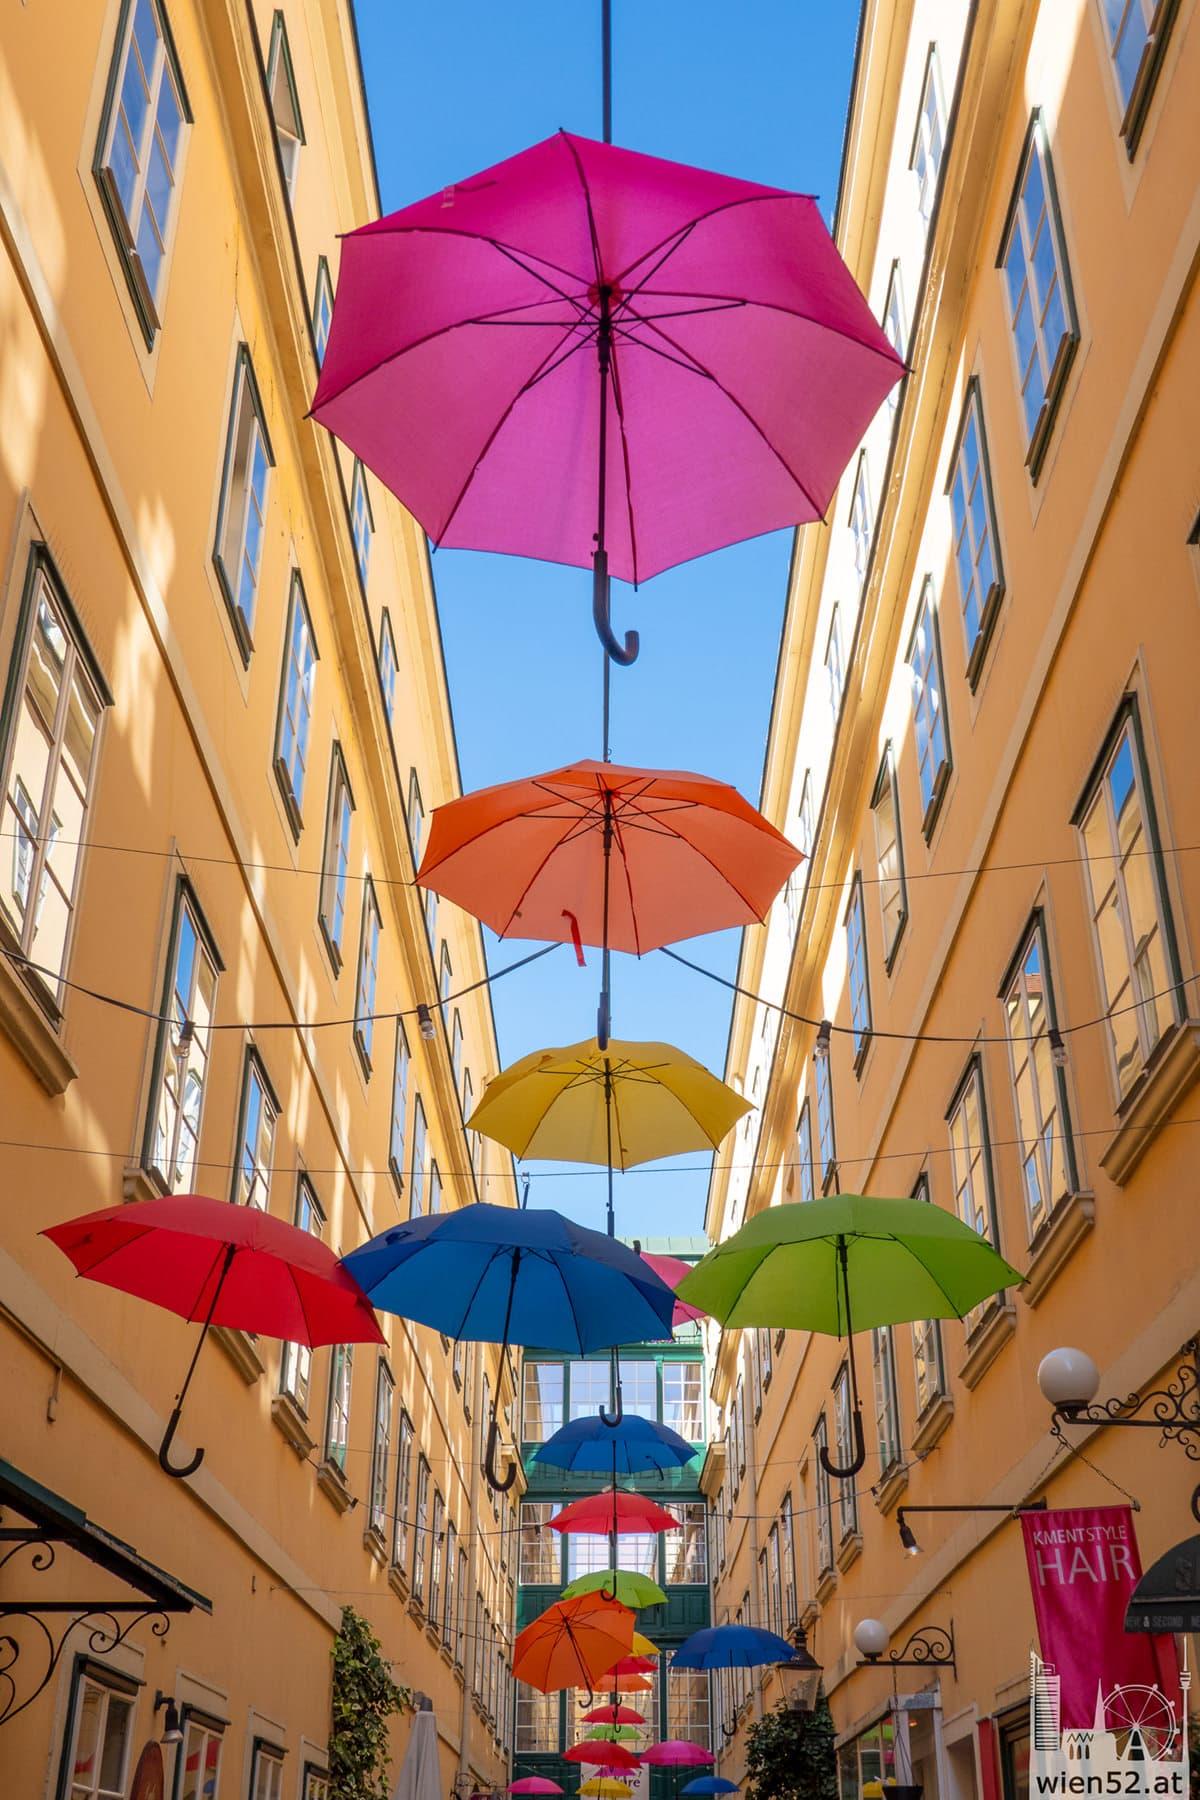 Regenschirme in der Sünnhof Passage